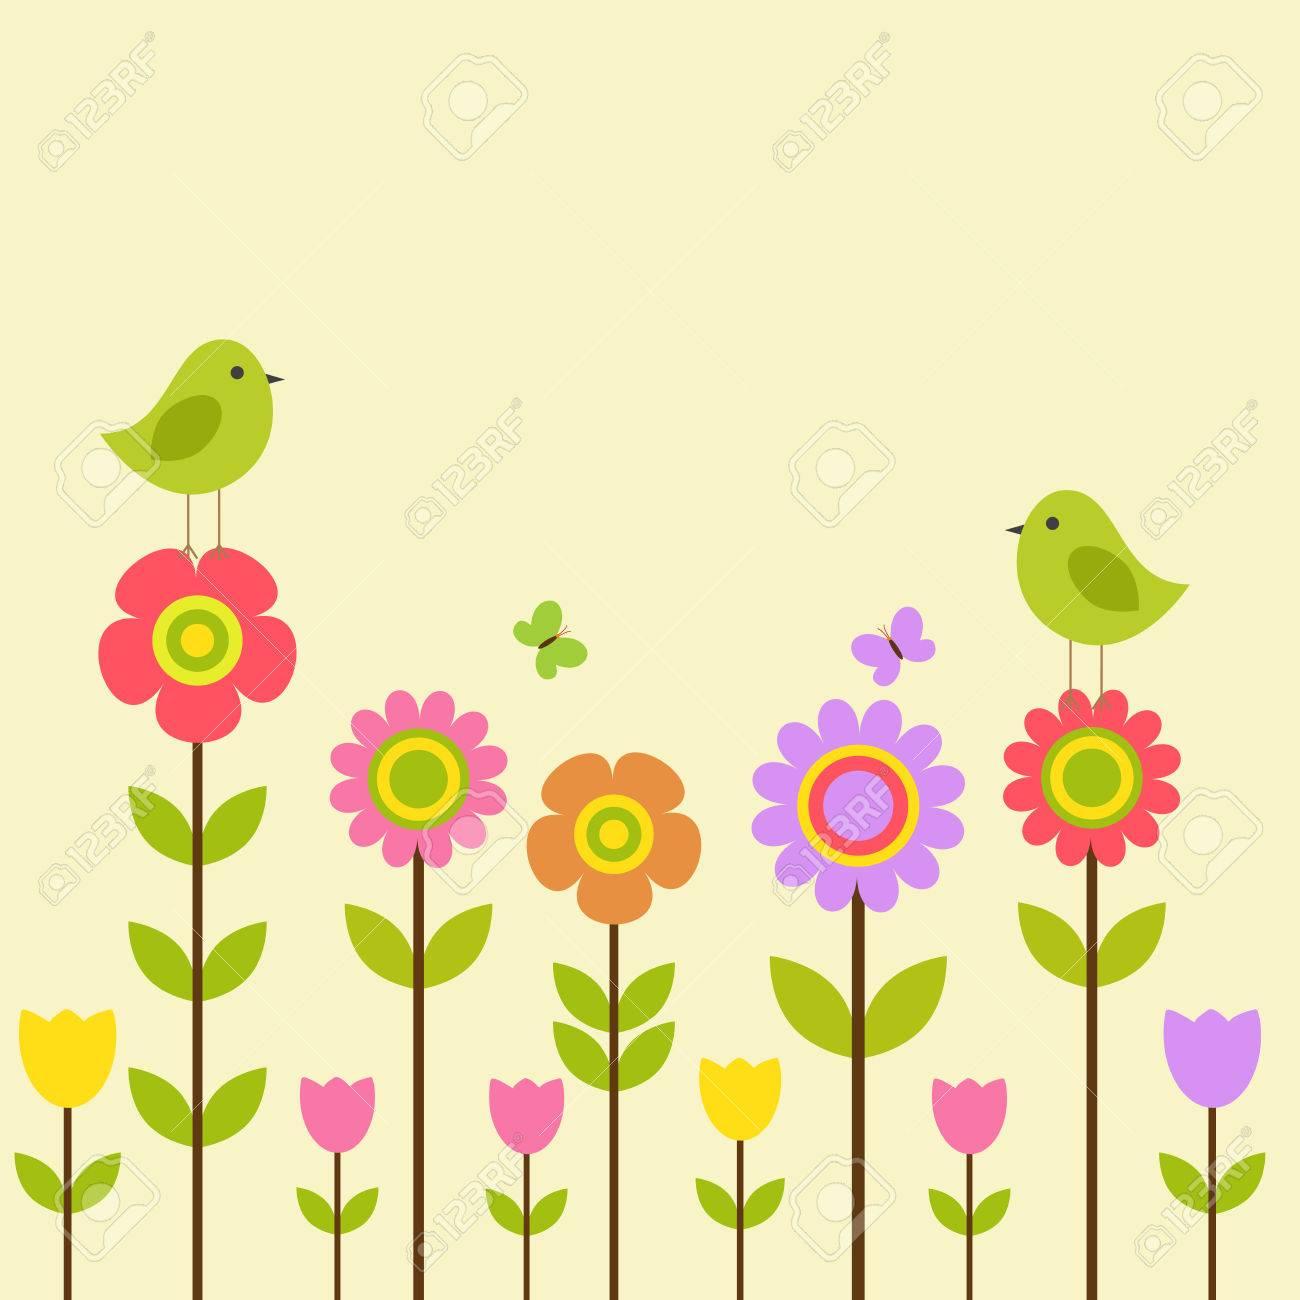 Vector Postkarte Rahmen Auf Dem Frühling-Sommer-Thema. Vögel Unter ...